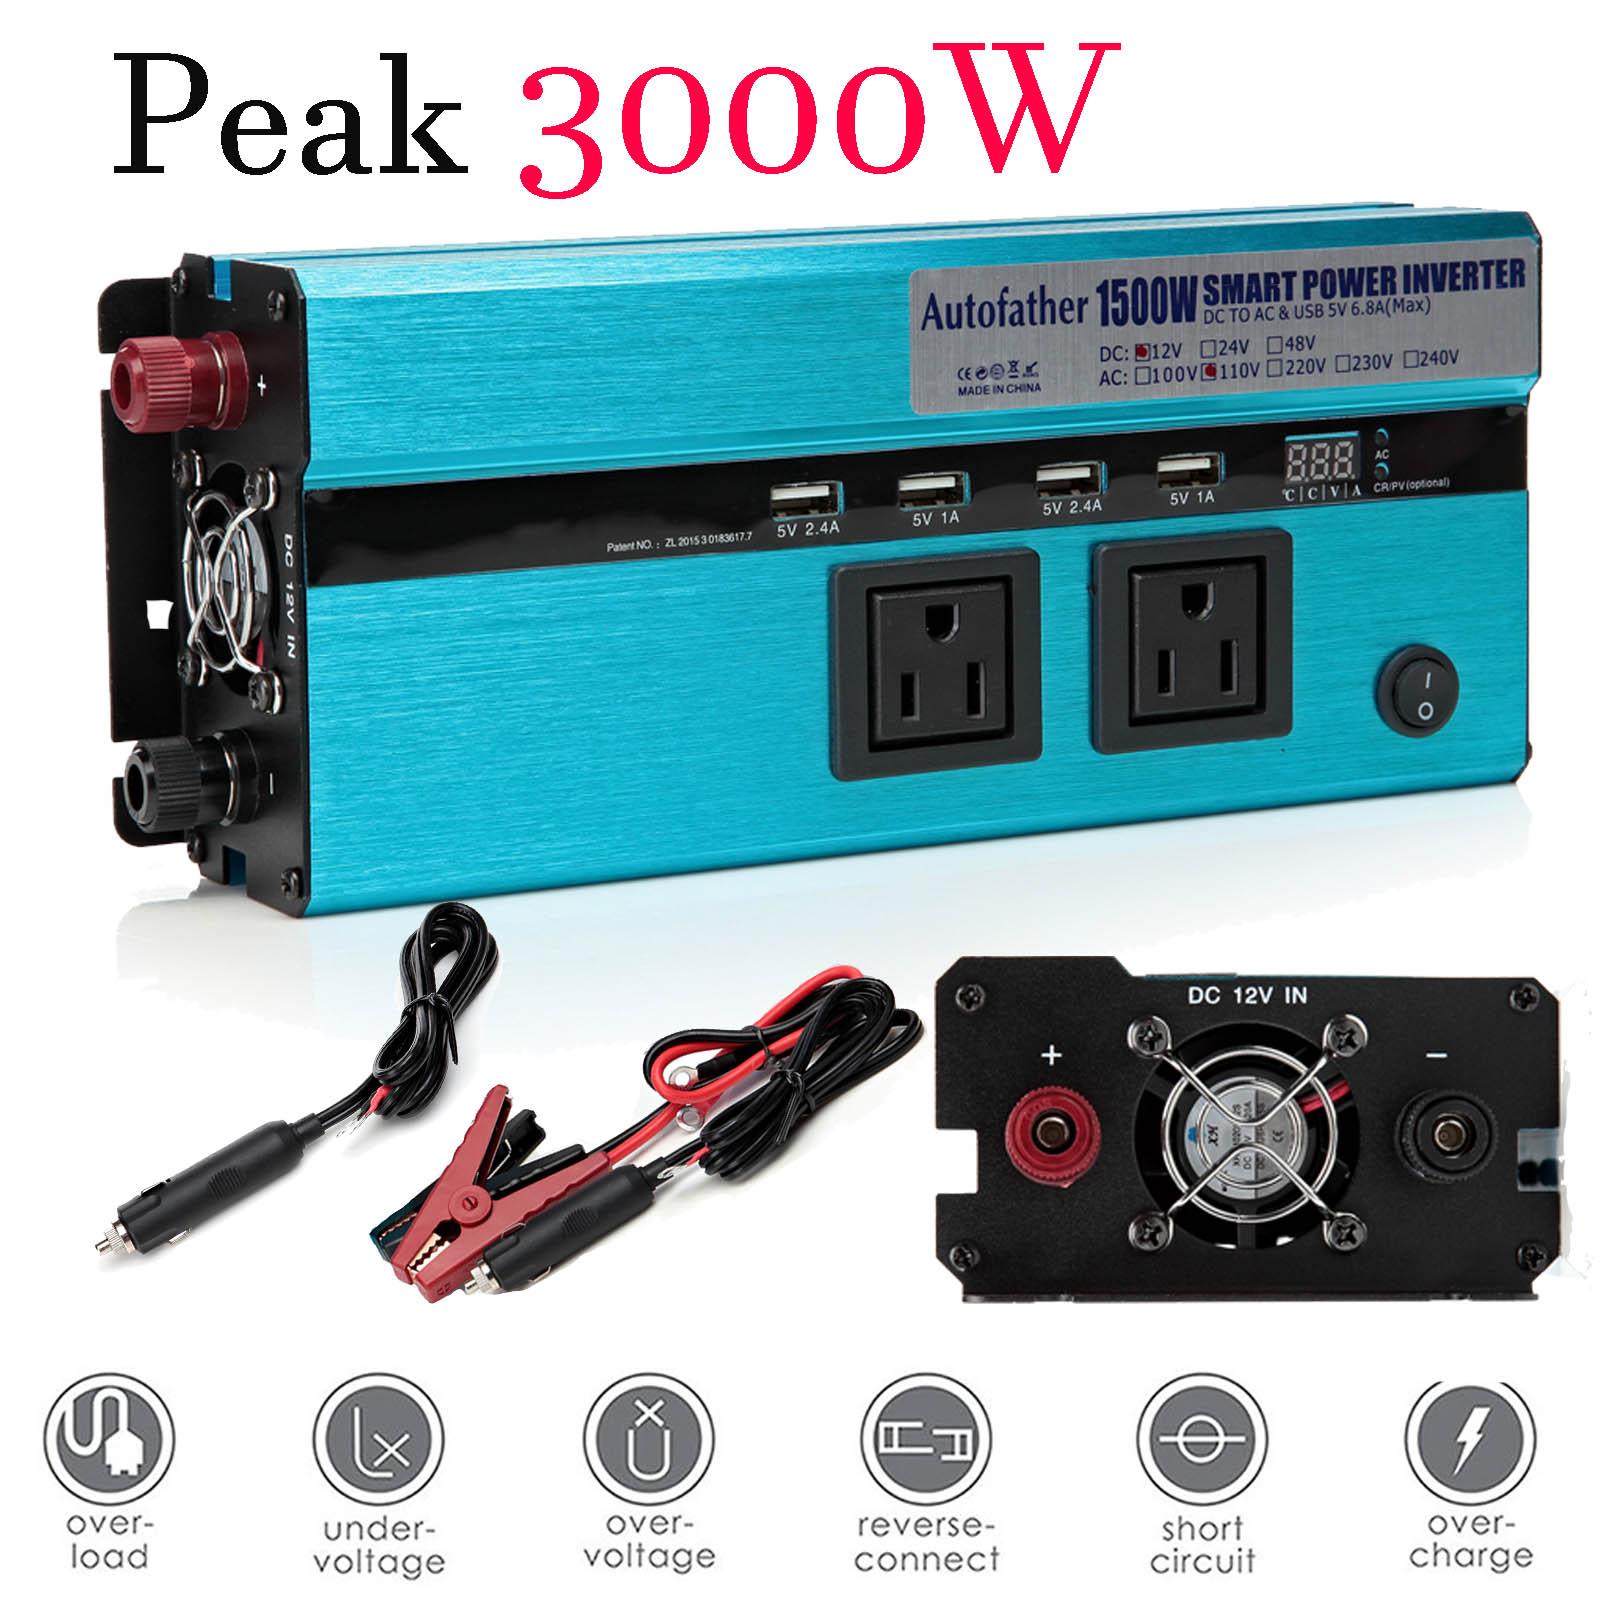 4000W Peak 2000W Power Inverter DC 12V AC 110V Car Converter 4 USB ports Charger